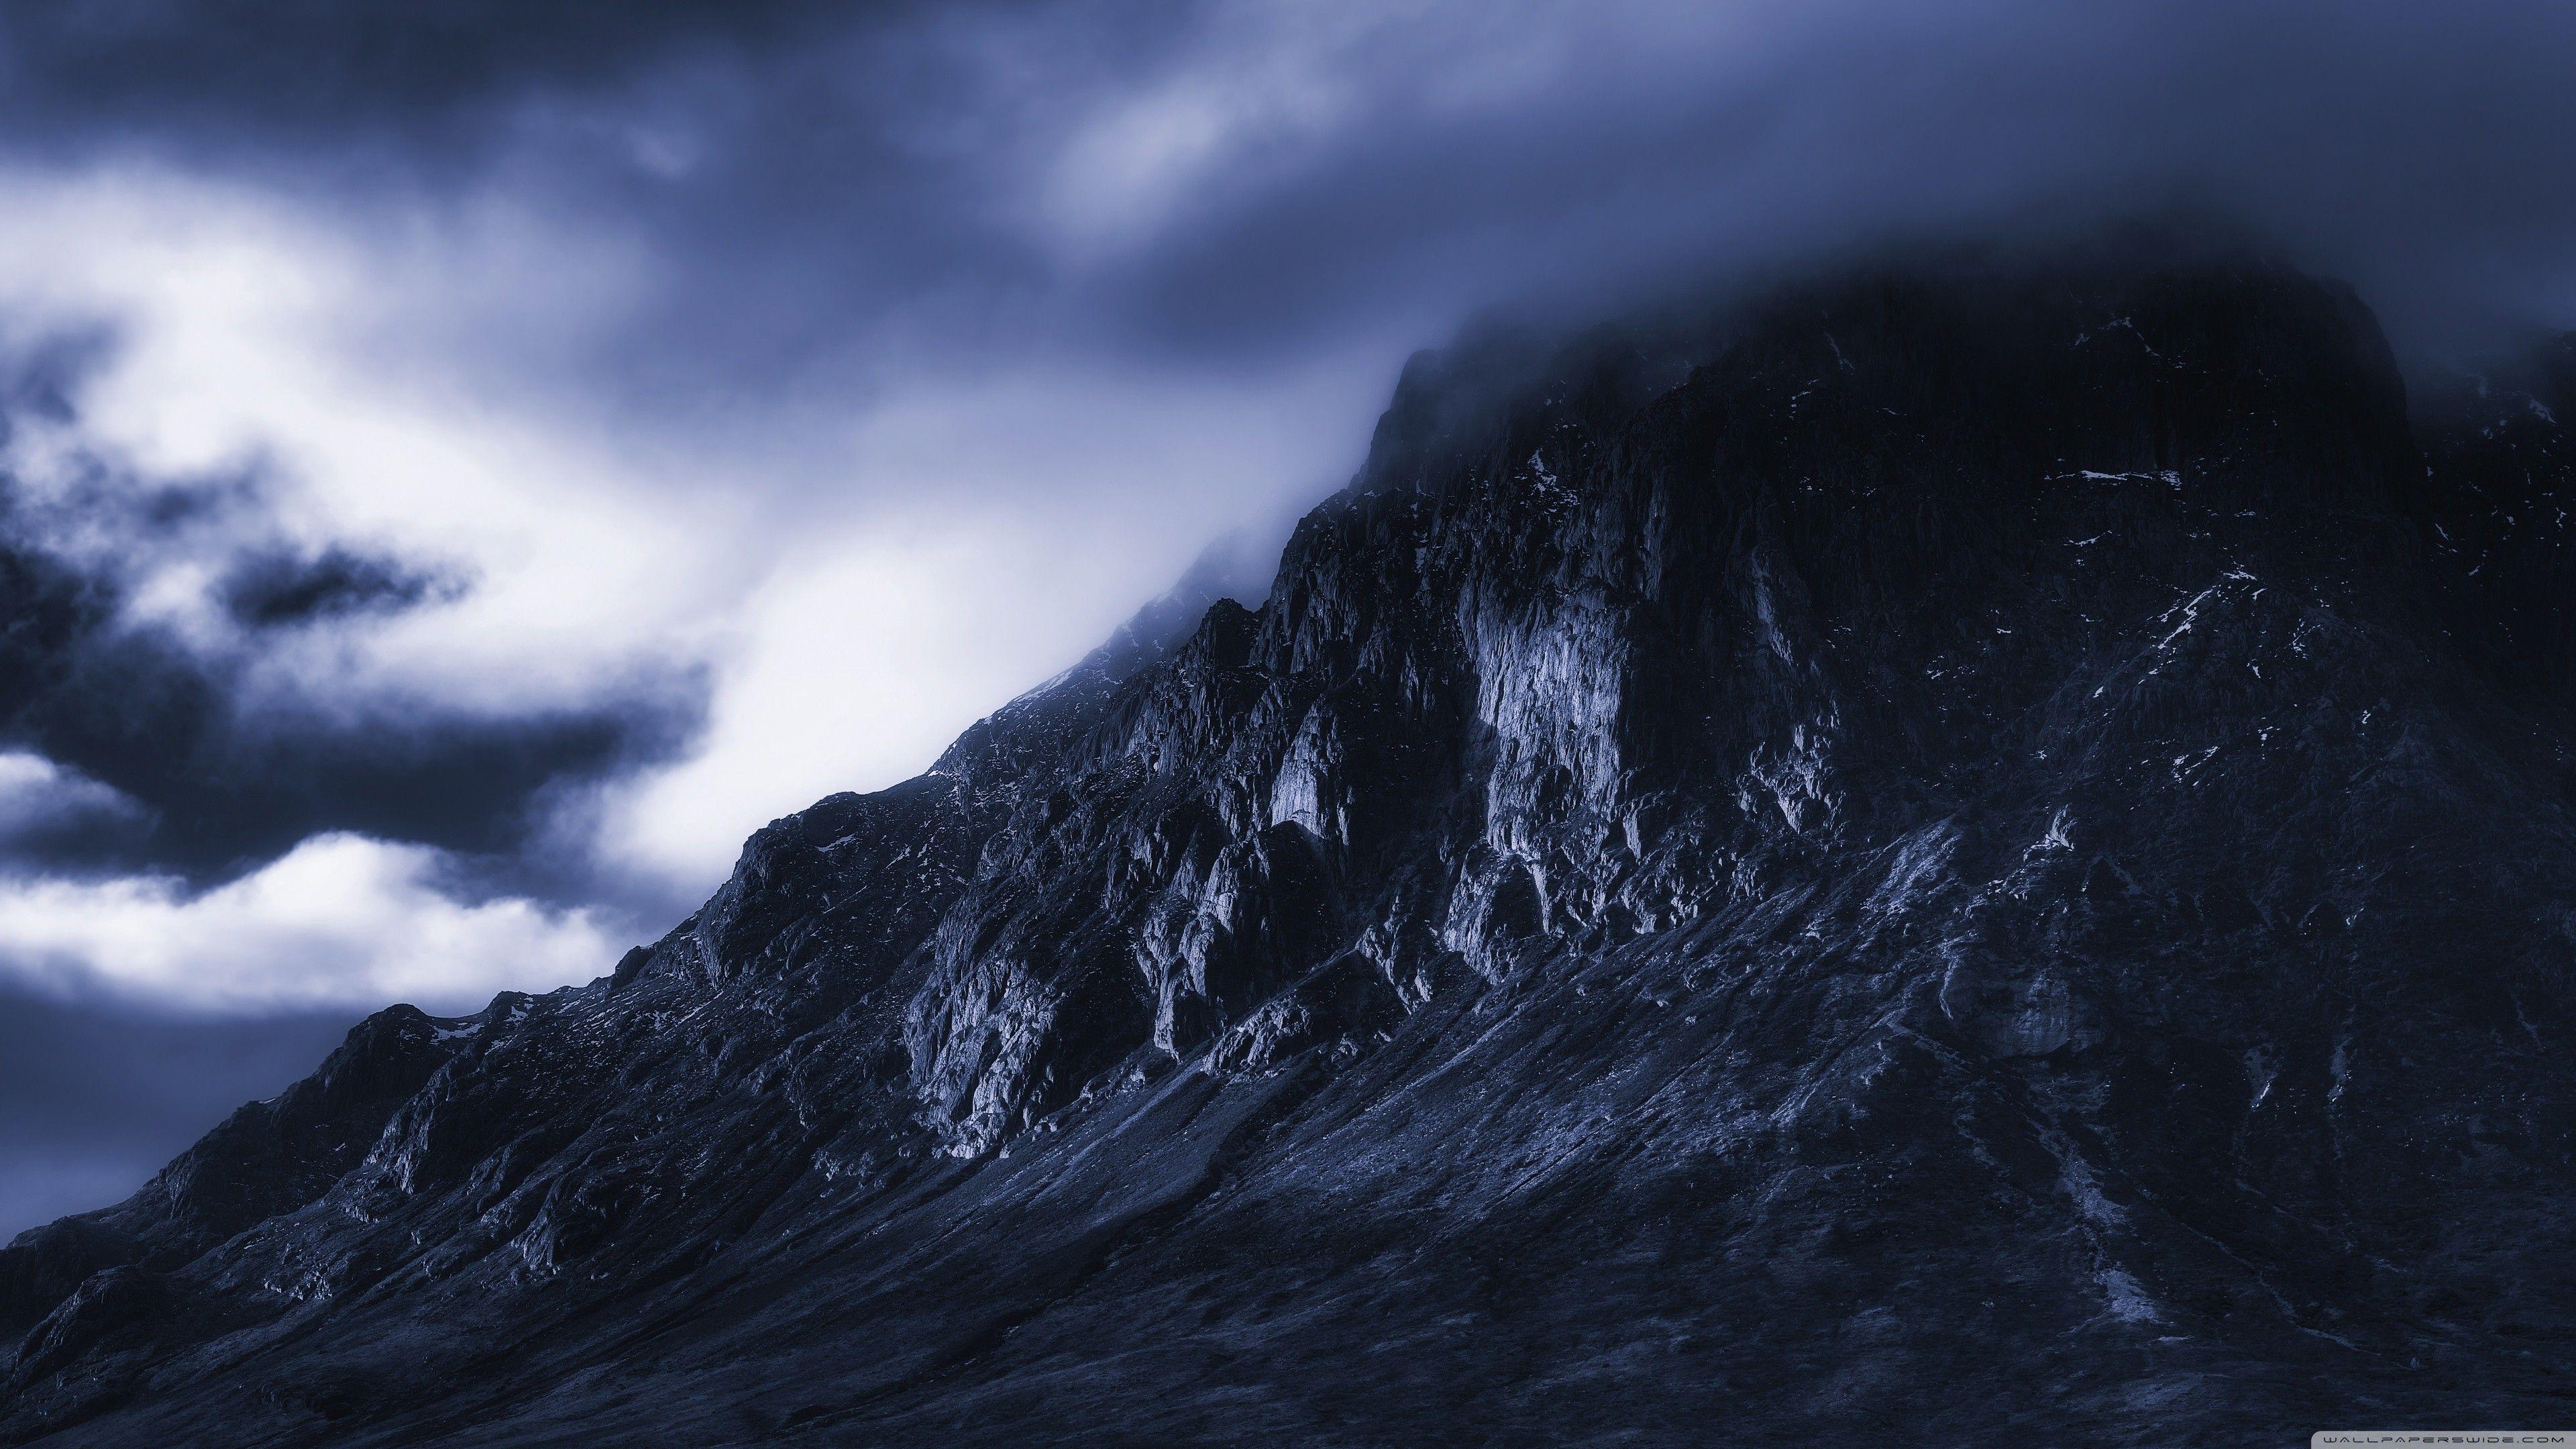 Res 3840x2160 Uhd 16 9 Dark Mountains Mountain Wallpaper 4k Background